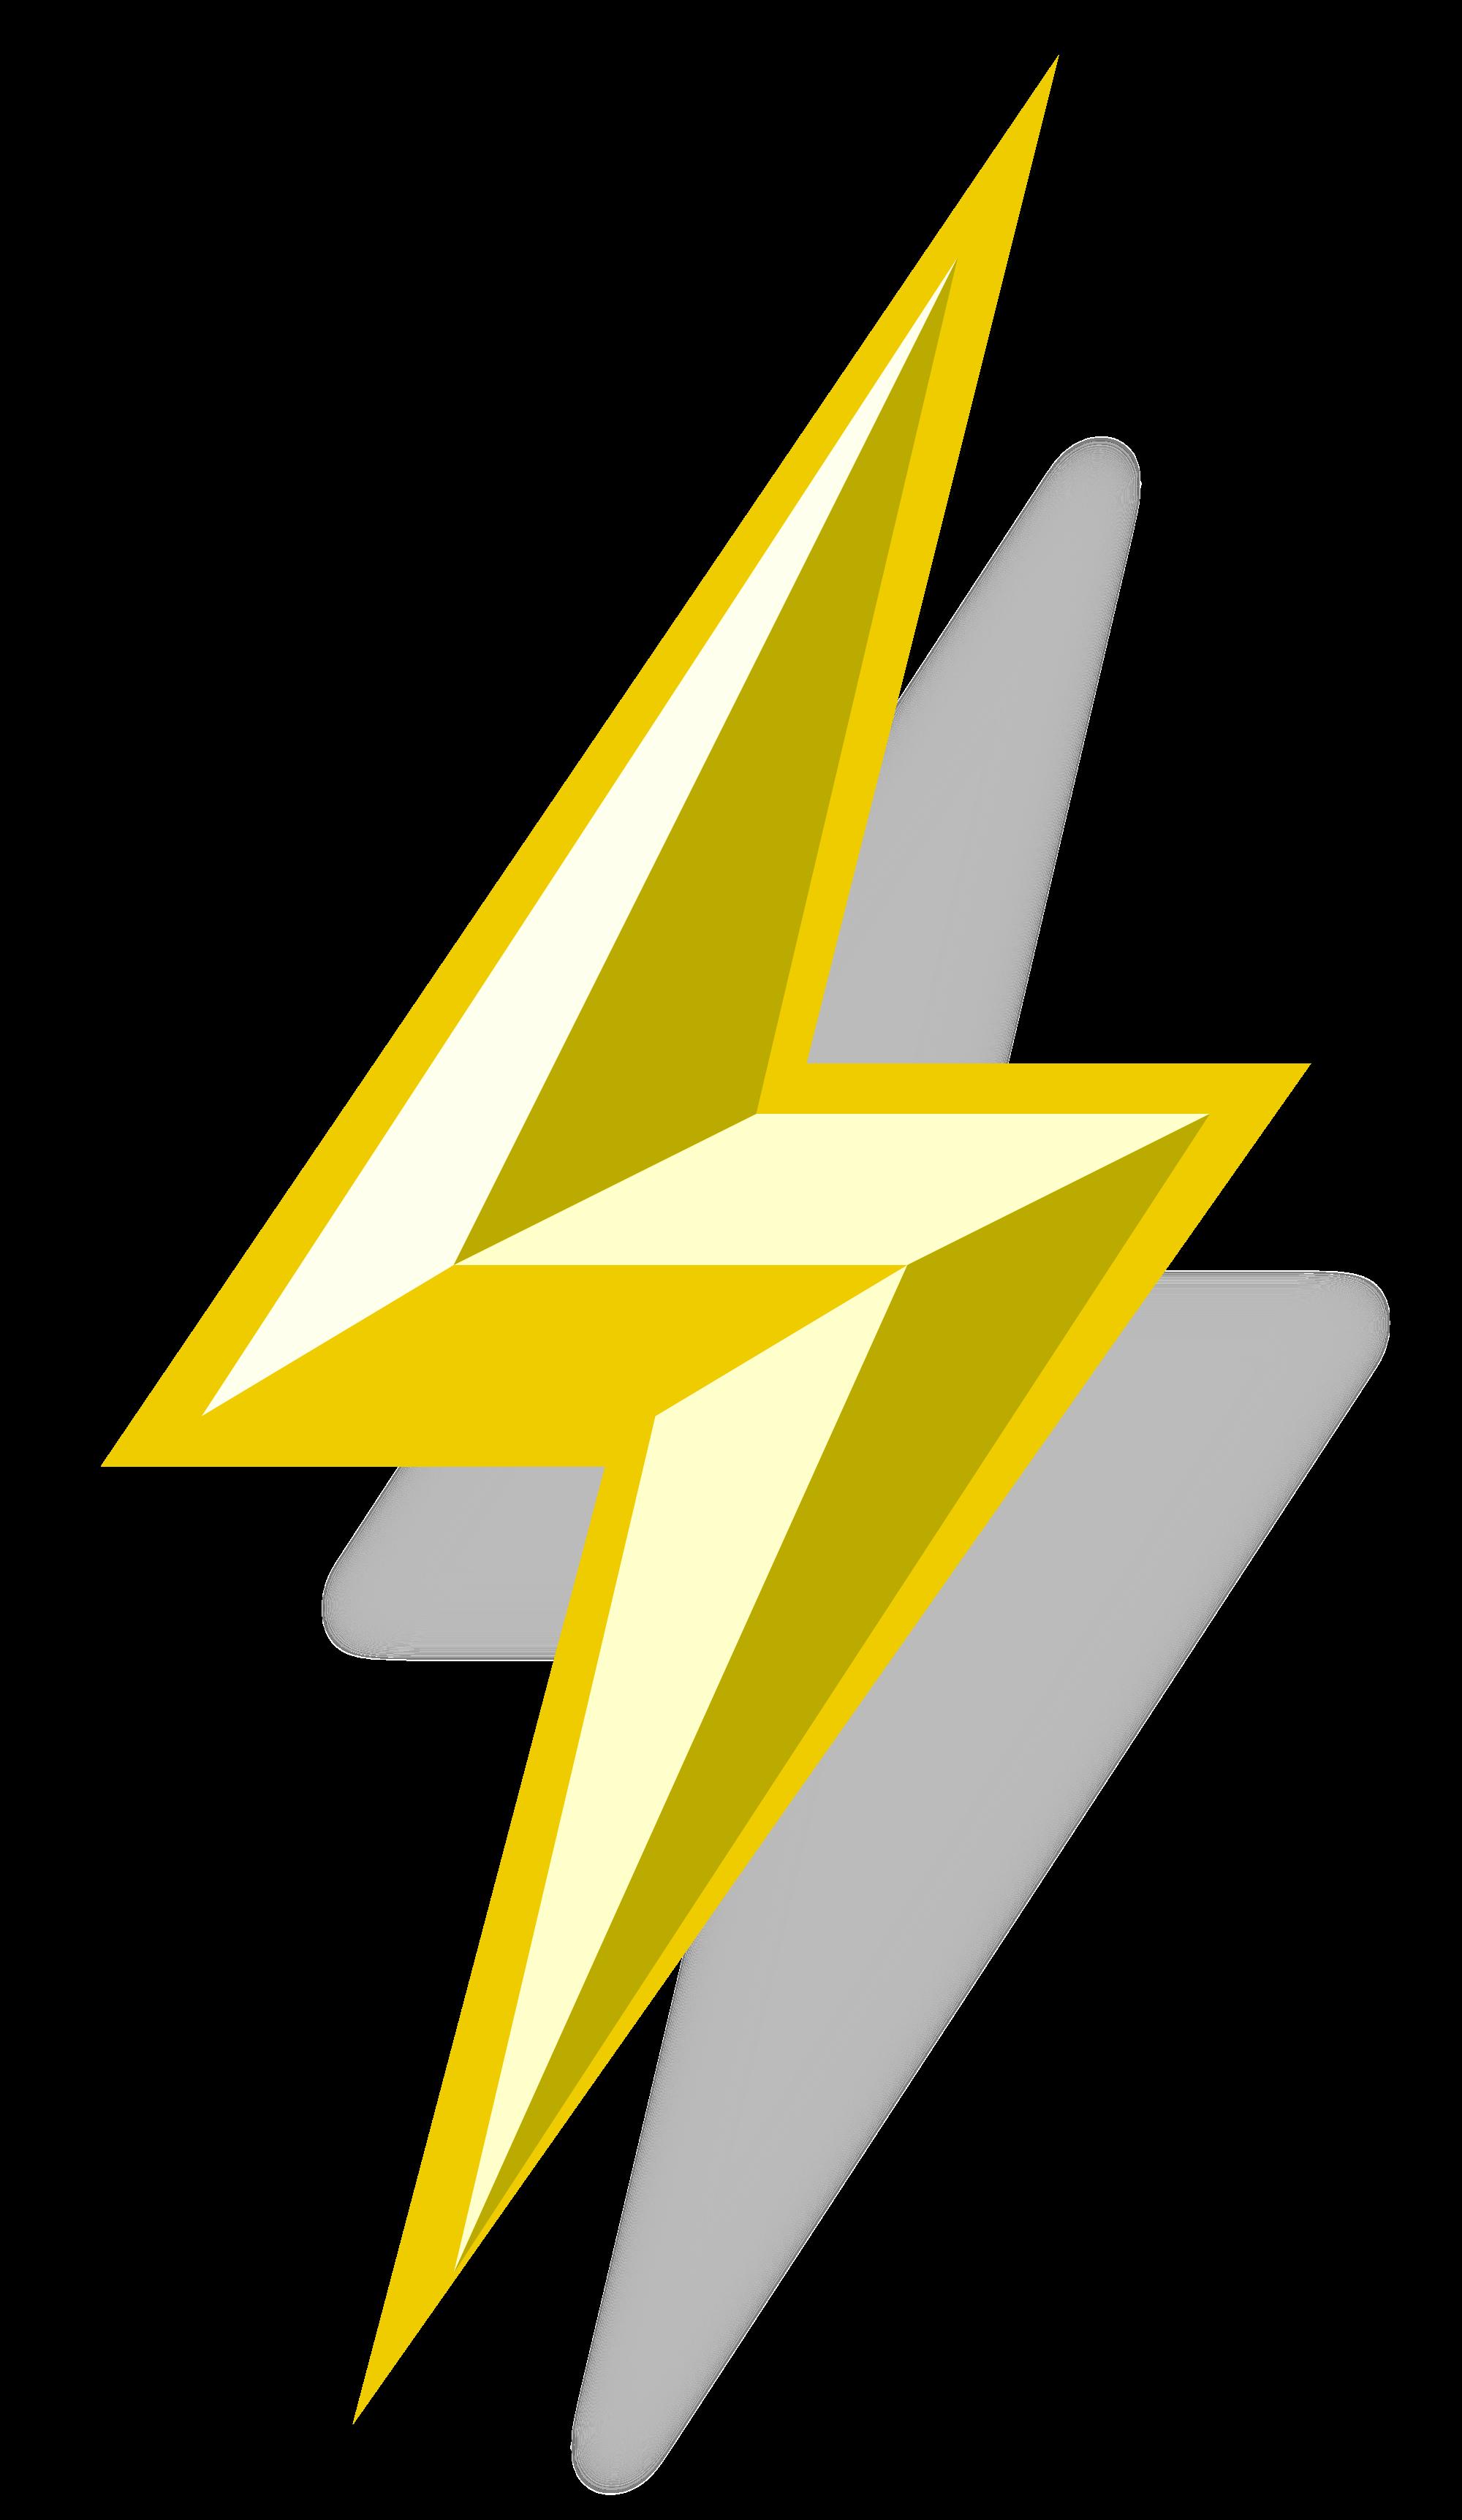 clip library library Bolts drawing flash. Lightning bolt image desktop